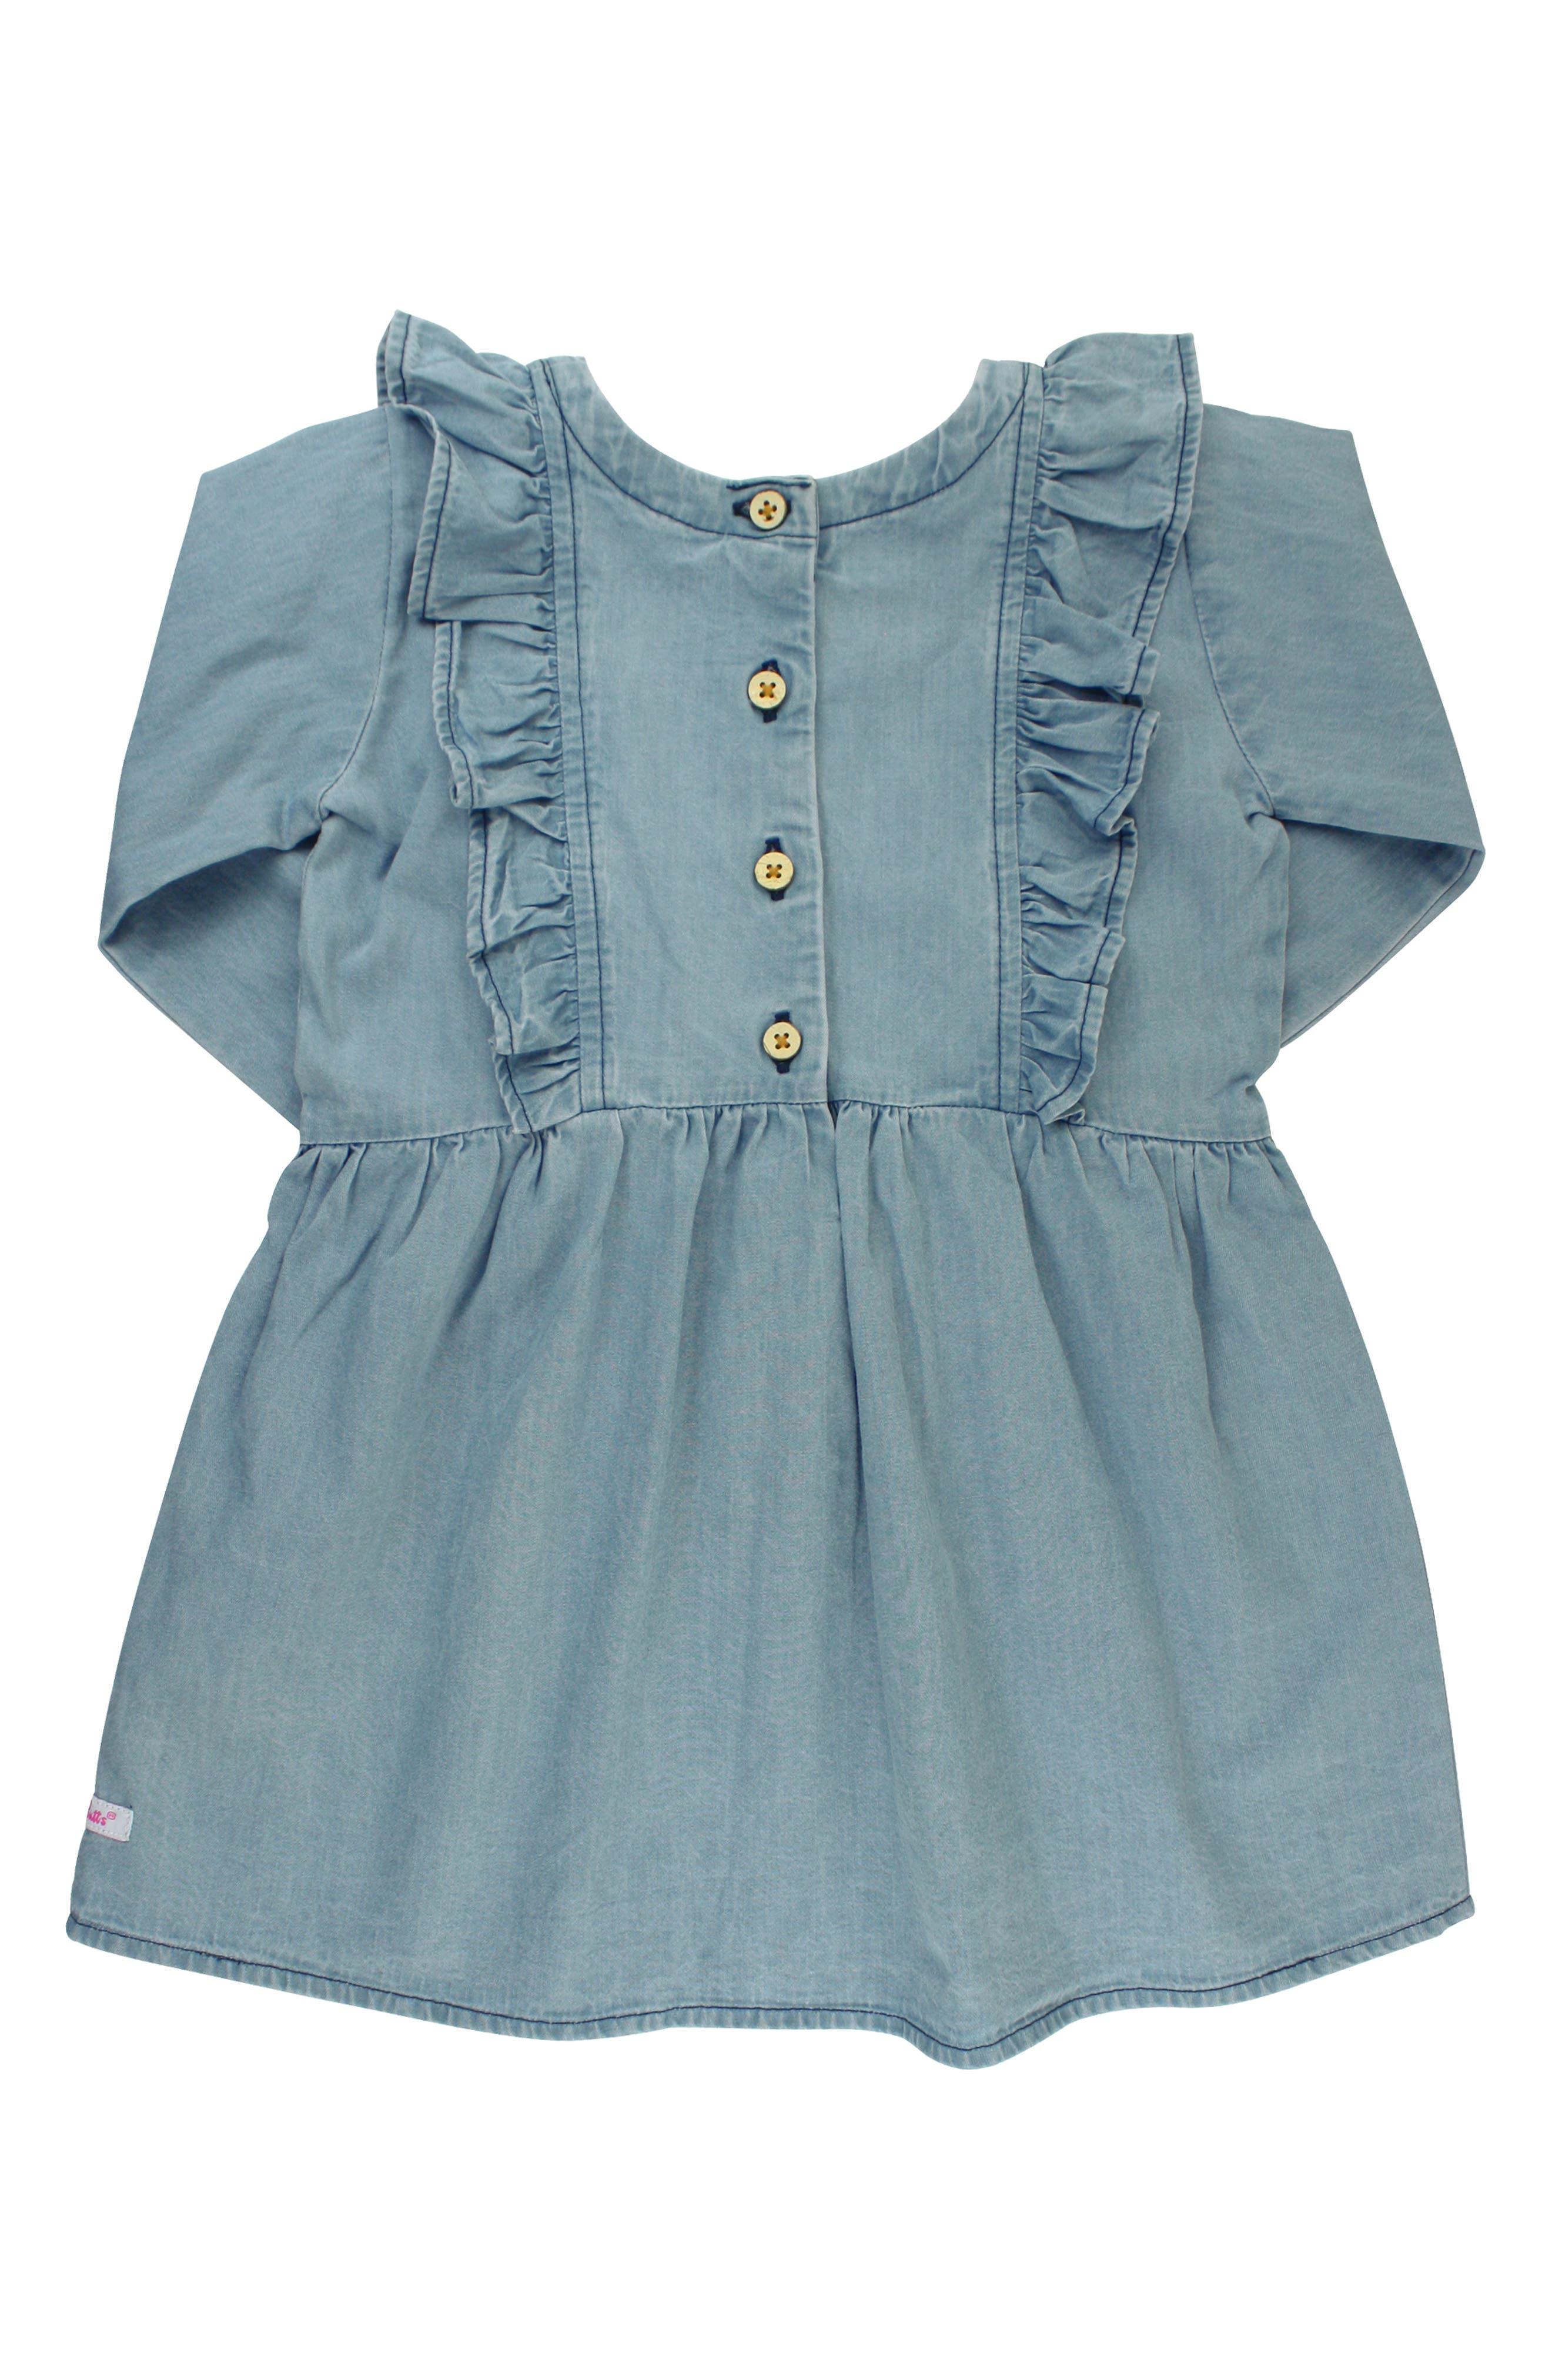 RUFFLEBUTTS,                             Cotton Chambray Dress & Headband Set,                             Alternate thumbnail 2, color,                             BLUE